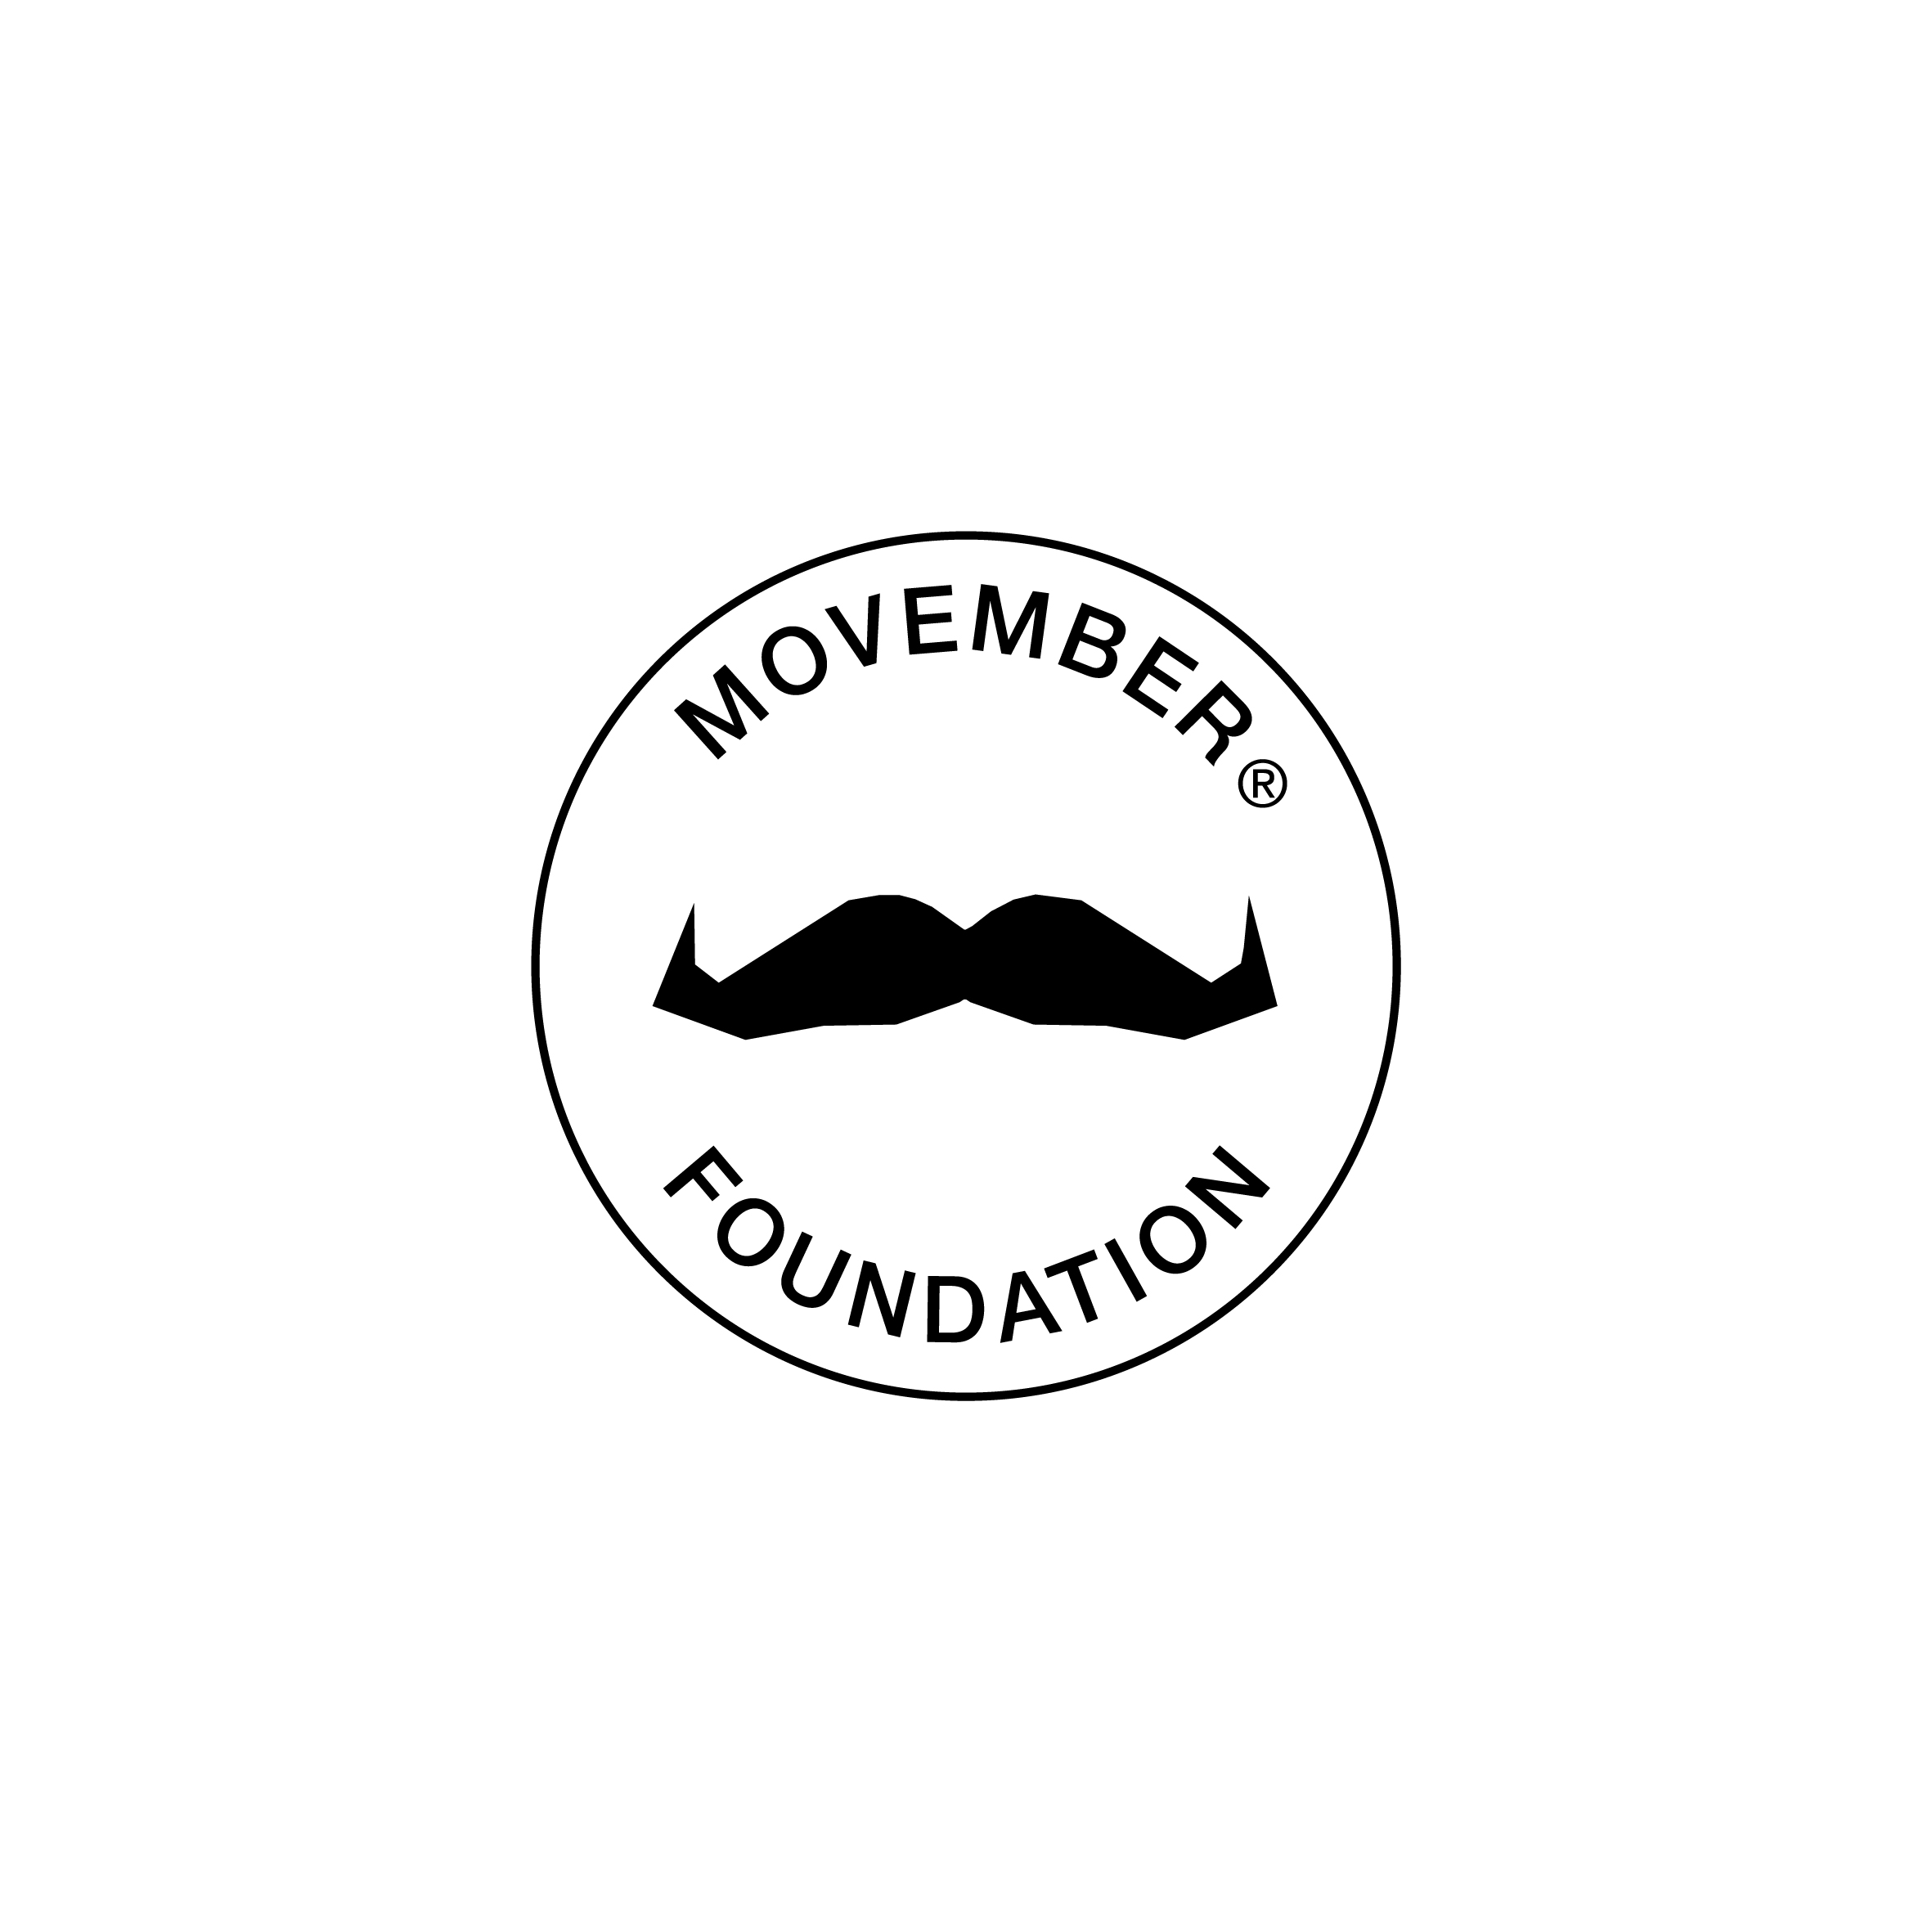 MOF-QFB241 Movember Foundation Primary_Logo_Black.jpg